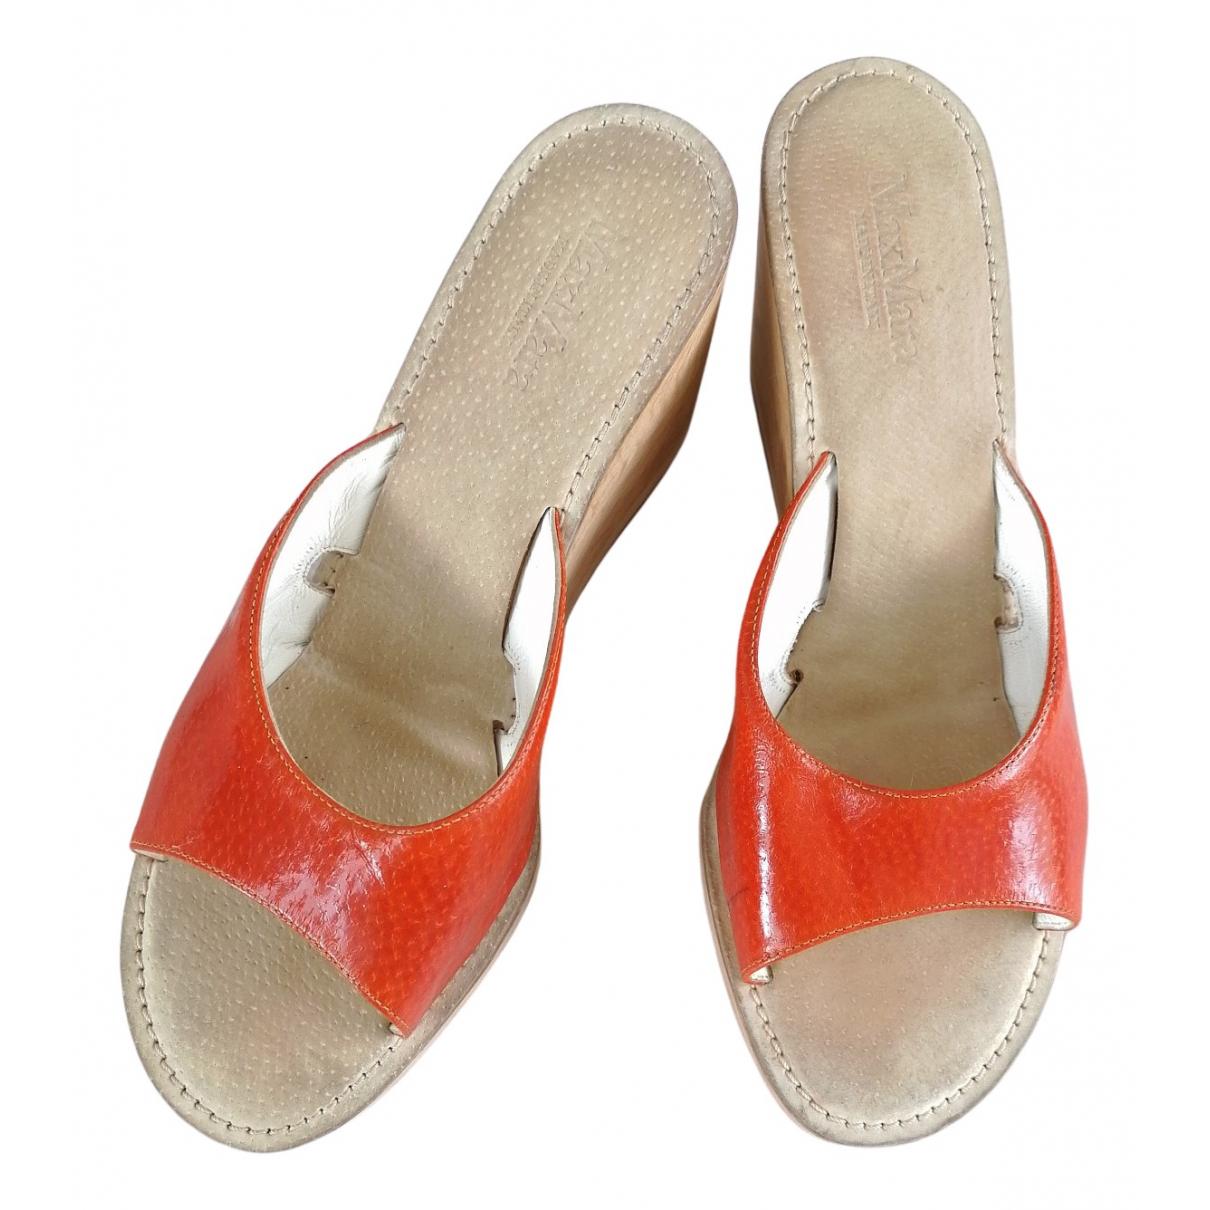 Max Mara N Orange Leather Sandals for Women 38 EU